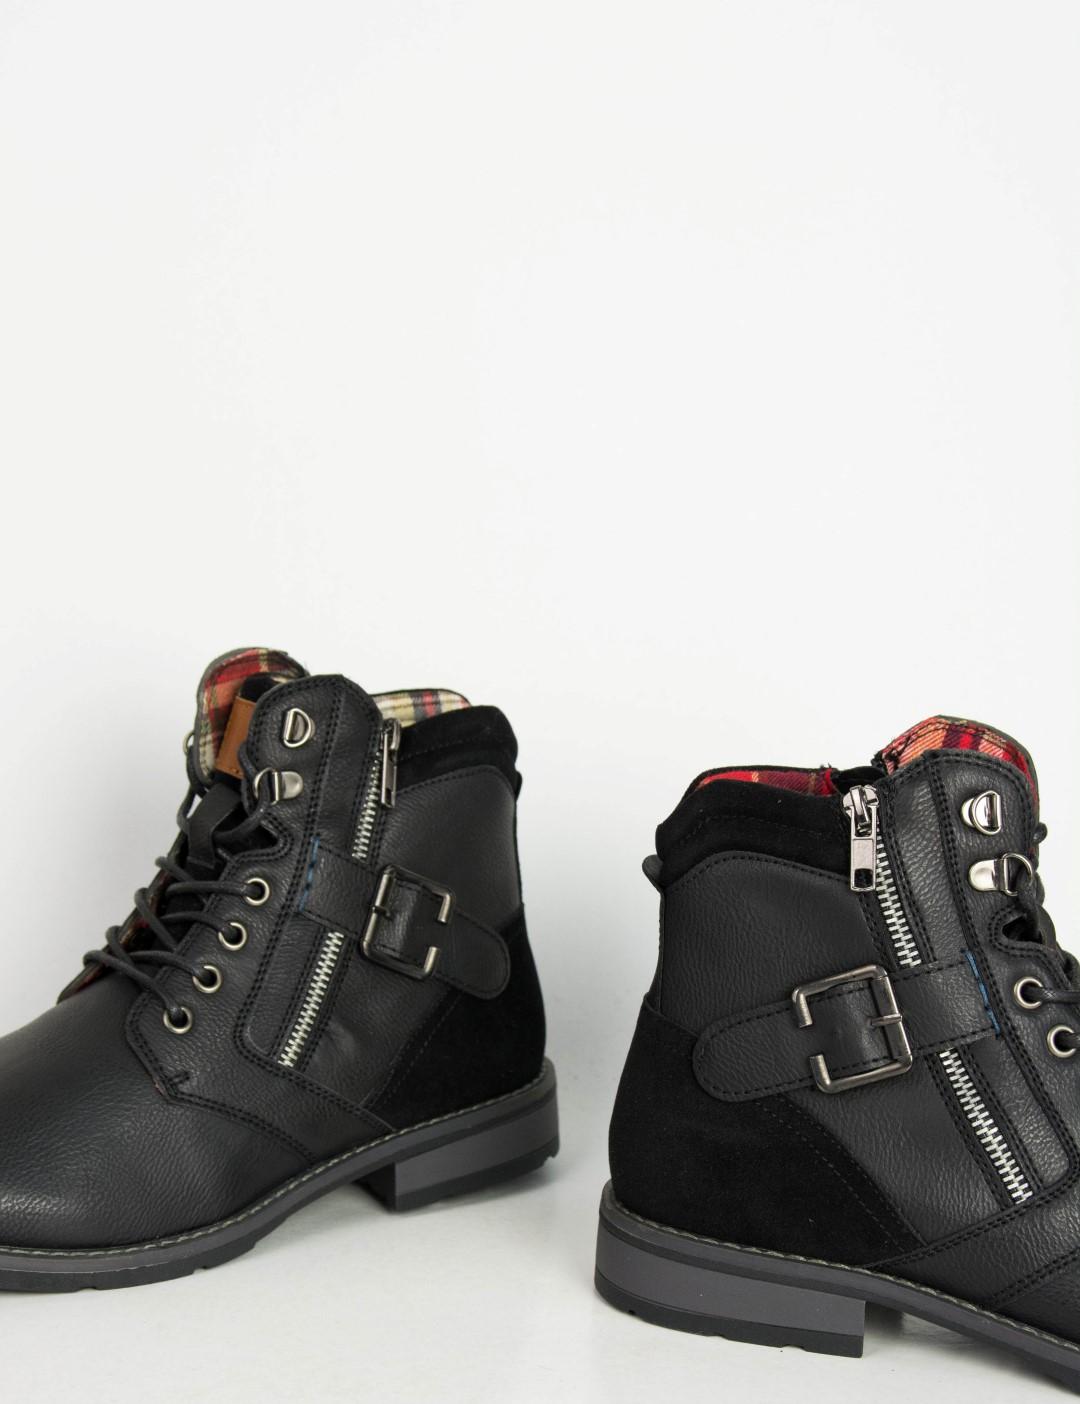 de66fba1f37 Ανδρικά μαύρα αρβυλάκια Biker με κορδόνια EL0611